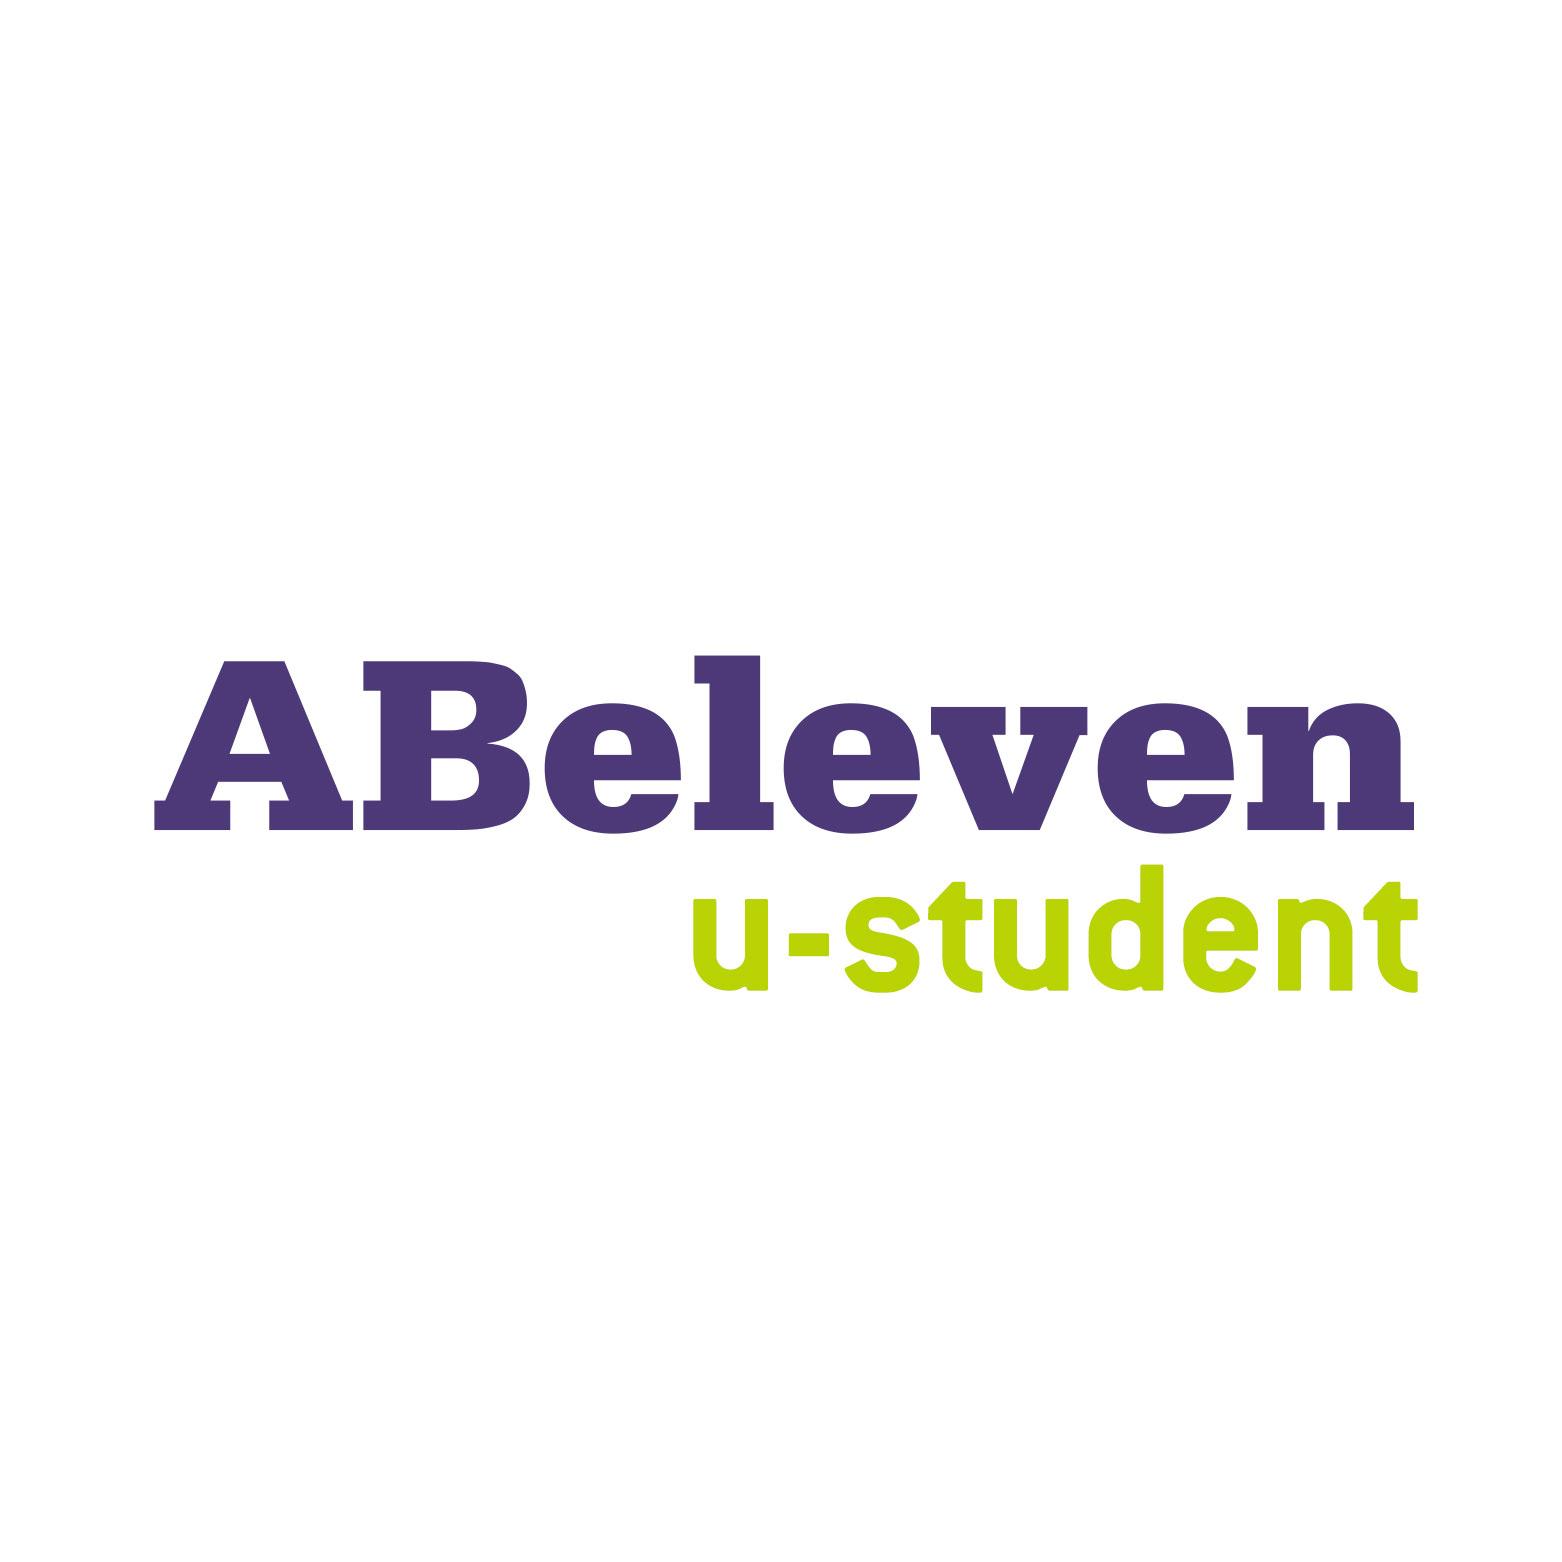 U Student Aberdeen